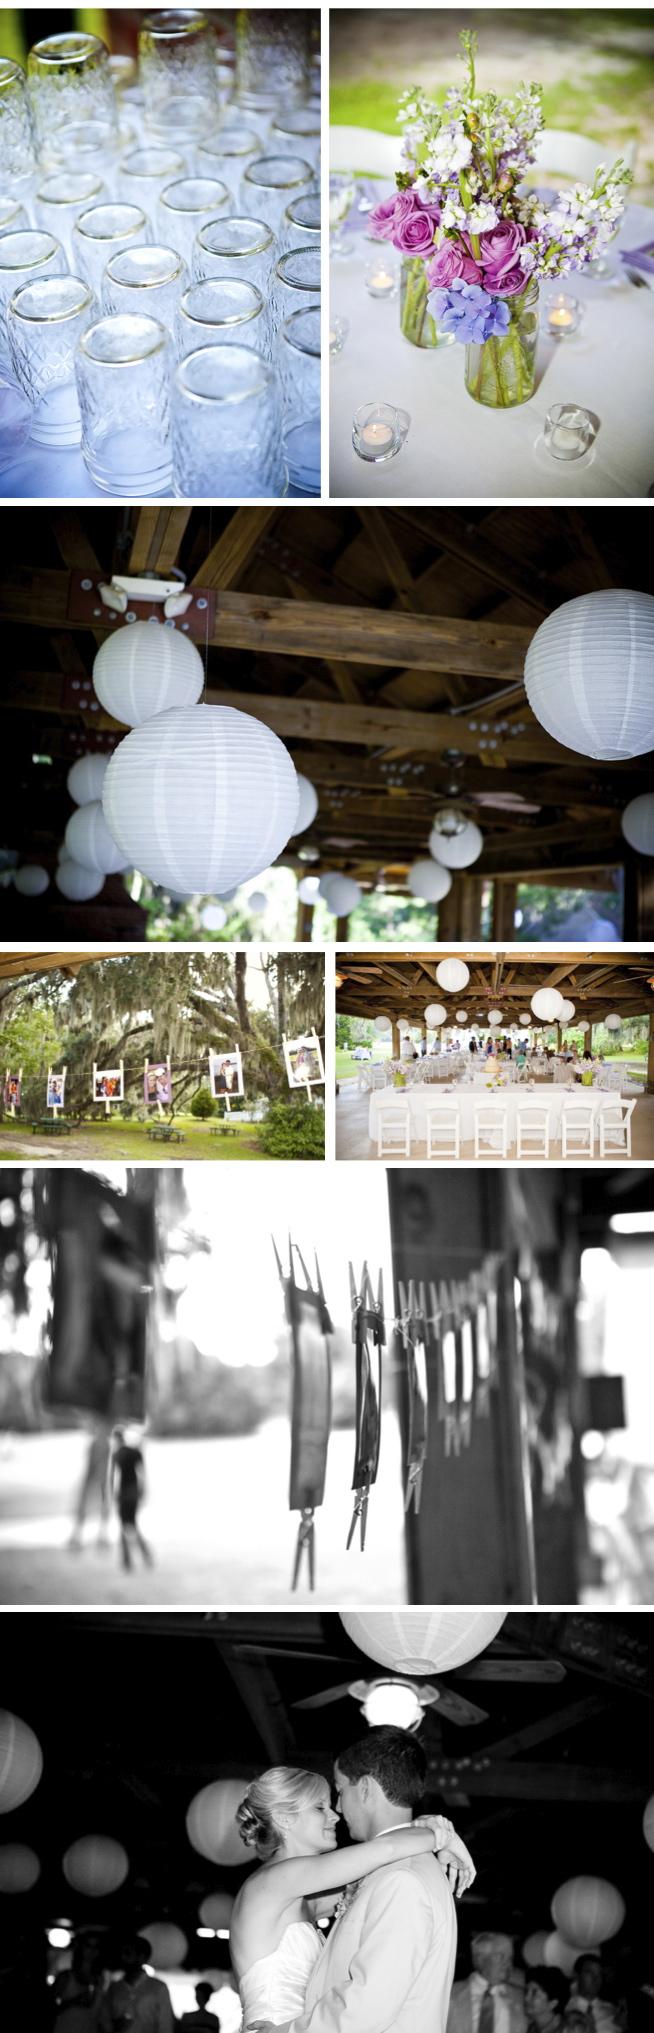 Weddings Ideas | Southern Weddings